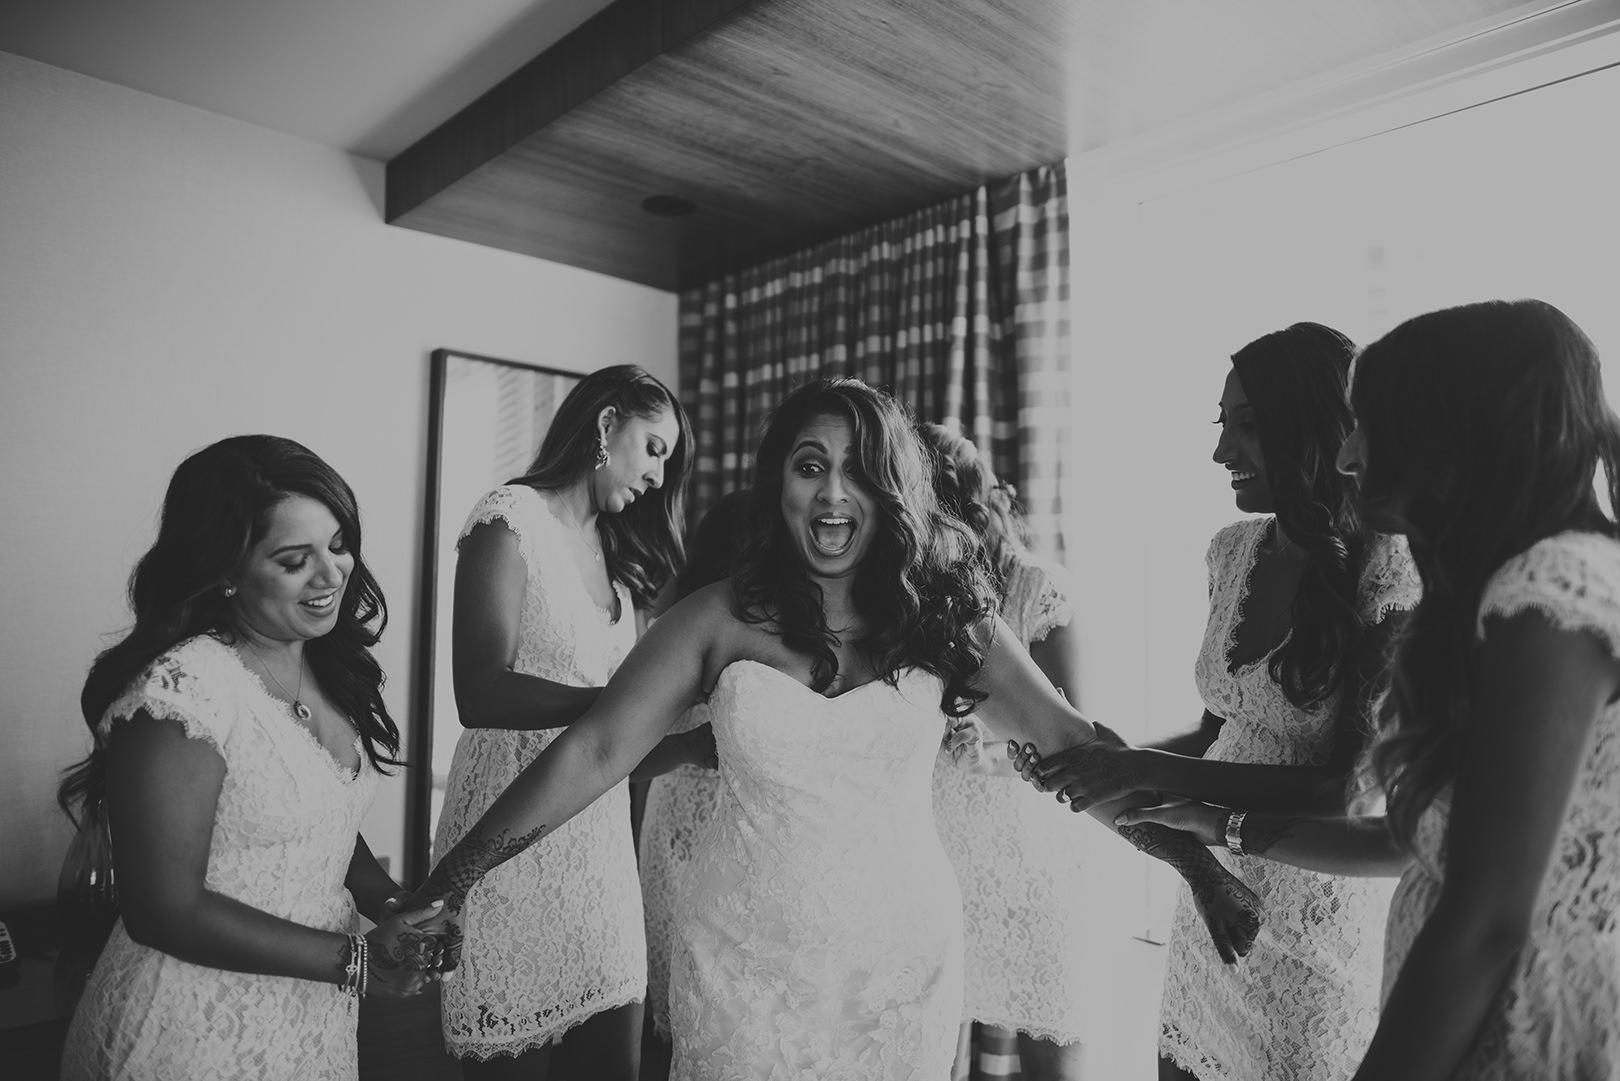 Spain Wedding Photographer - © Dallas Kolotylo Photography - 091